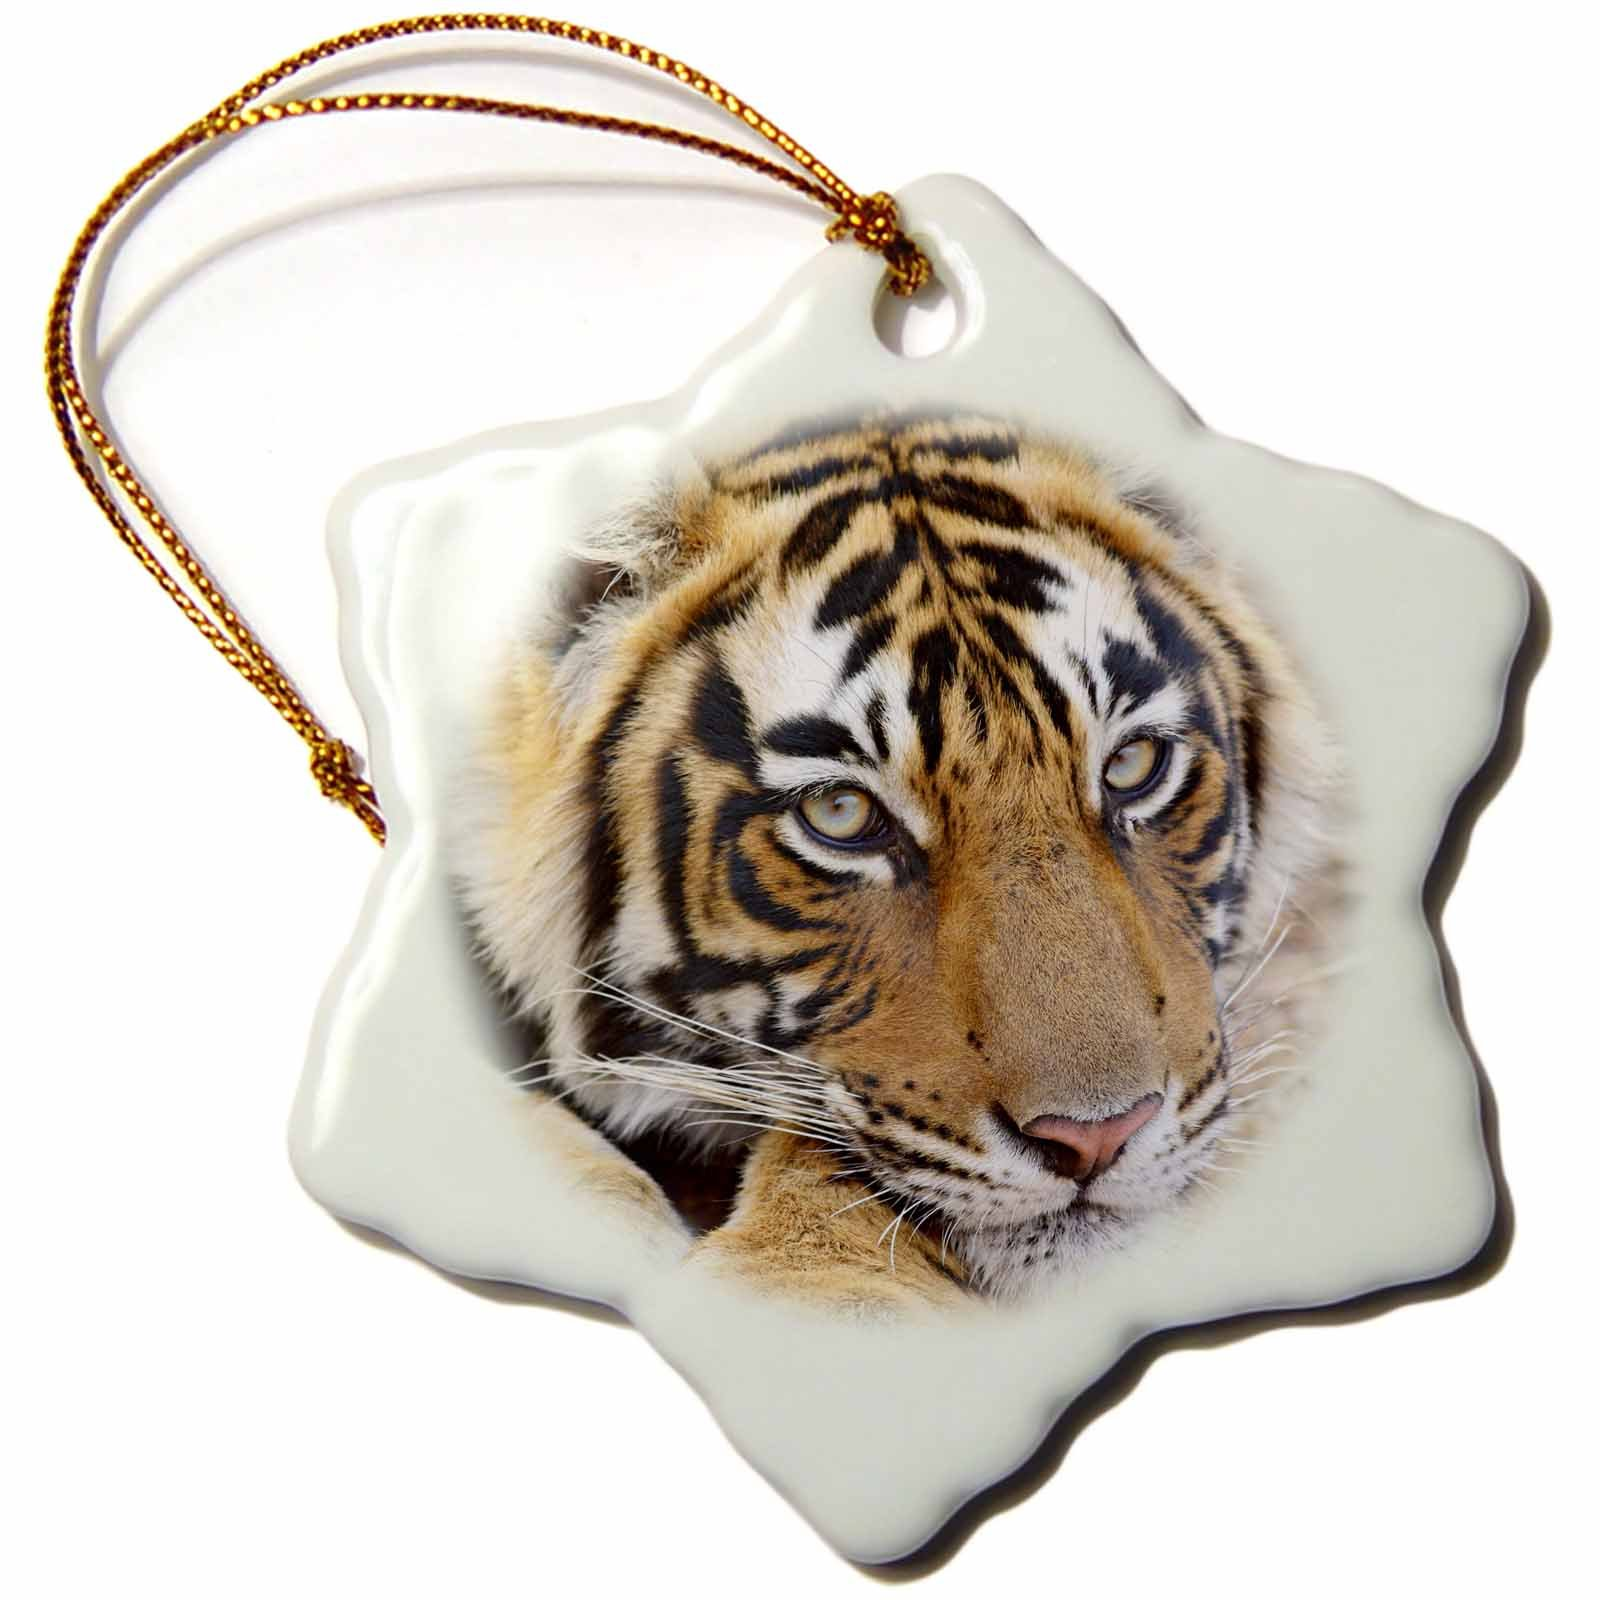 3dRose Royal Bengal Tiger, Ranthambhor National Park, India Snowflake Ornament, 3'' by 3dRose (Image #1)